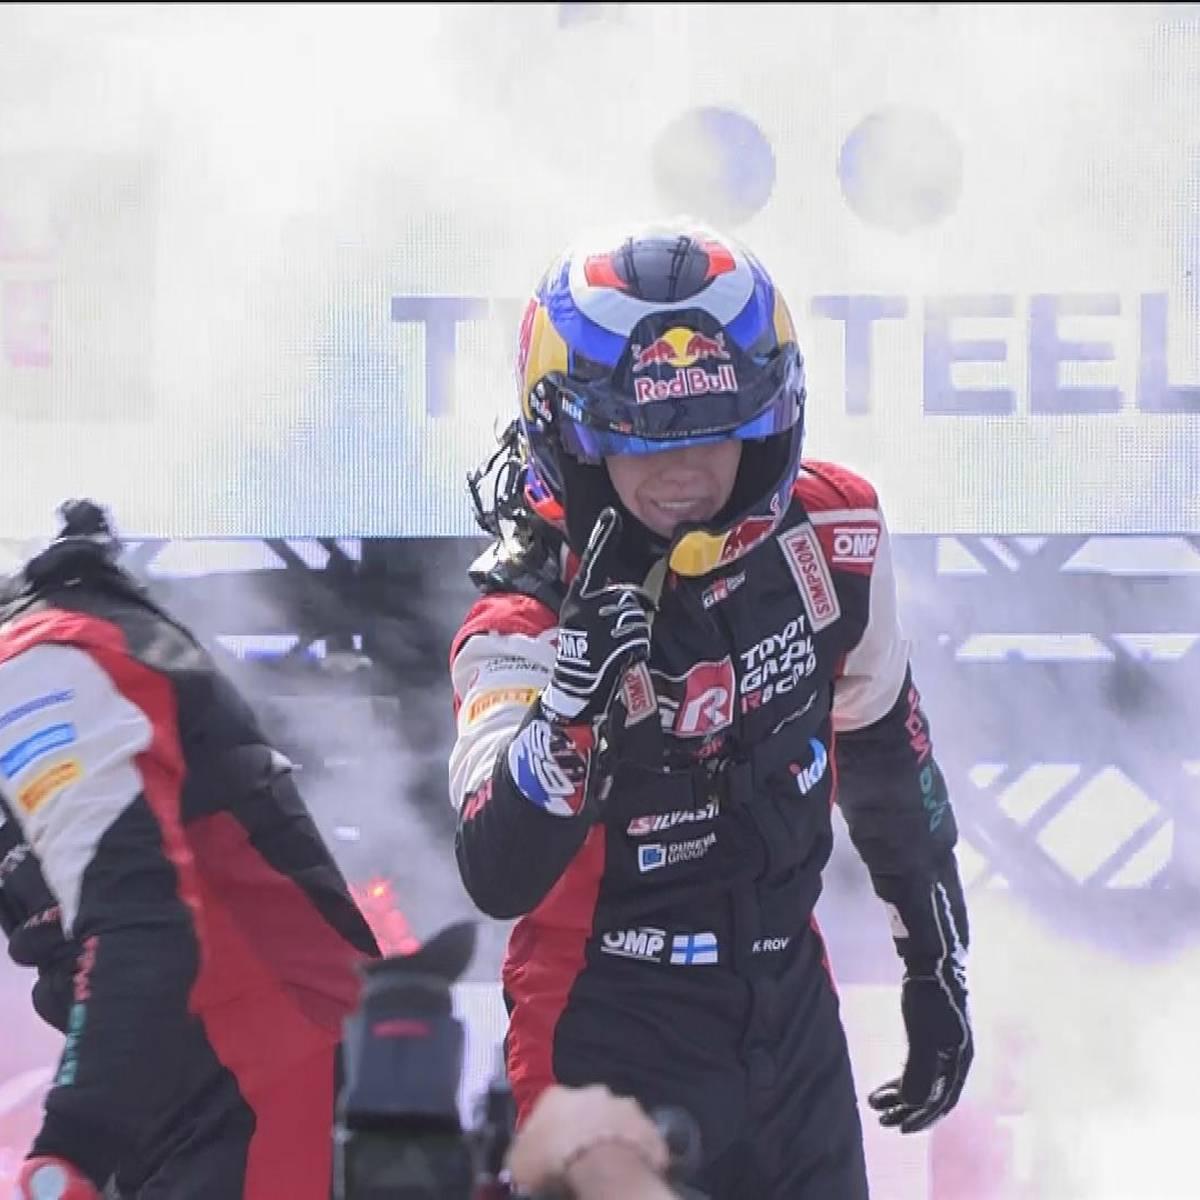 Rovanperä ist jüngster WRC-Sieger aller Zeiten - Tänak verzweifelt